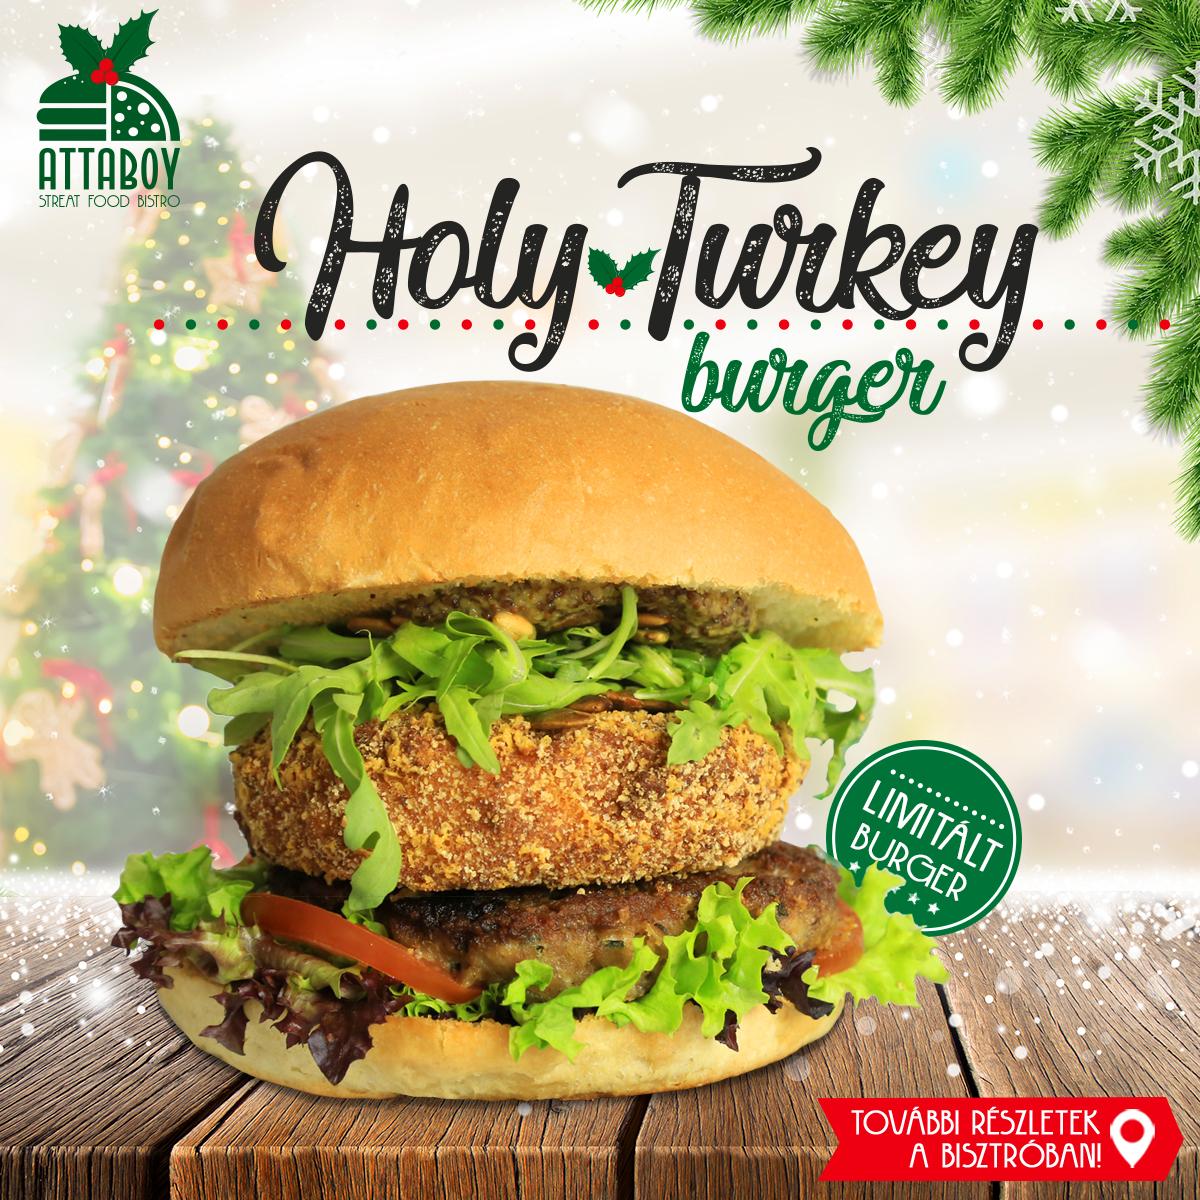 ATTABOY_Holy_Turkey_burger_mobil_banner_1200x1200